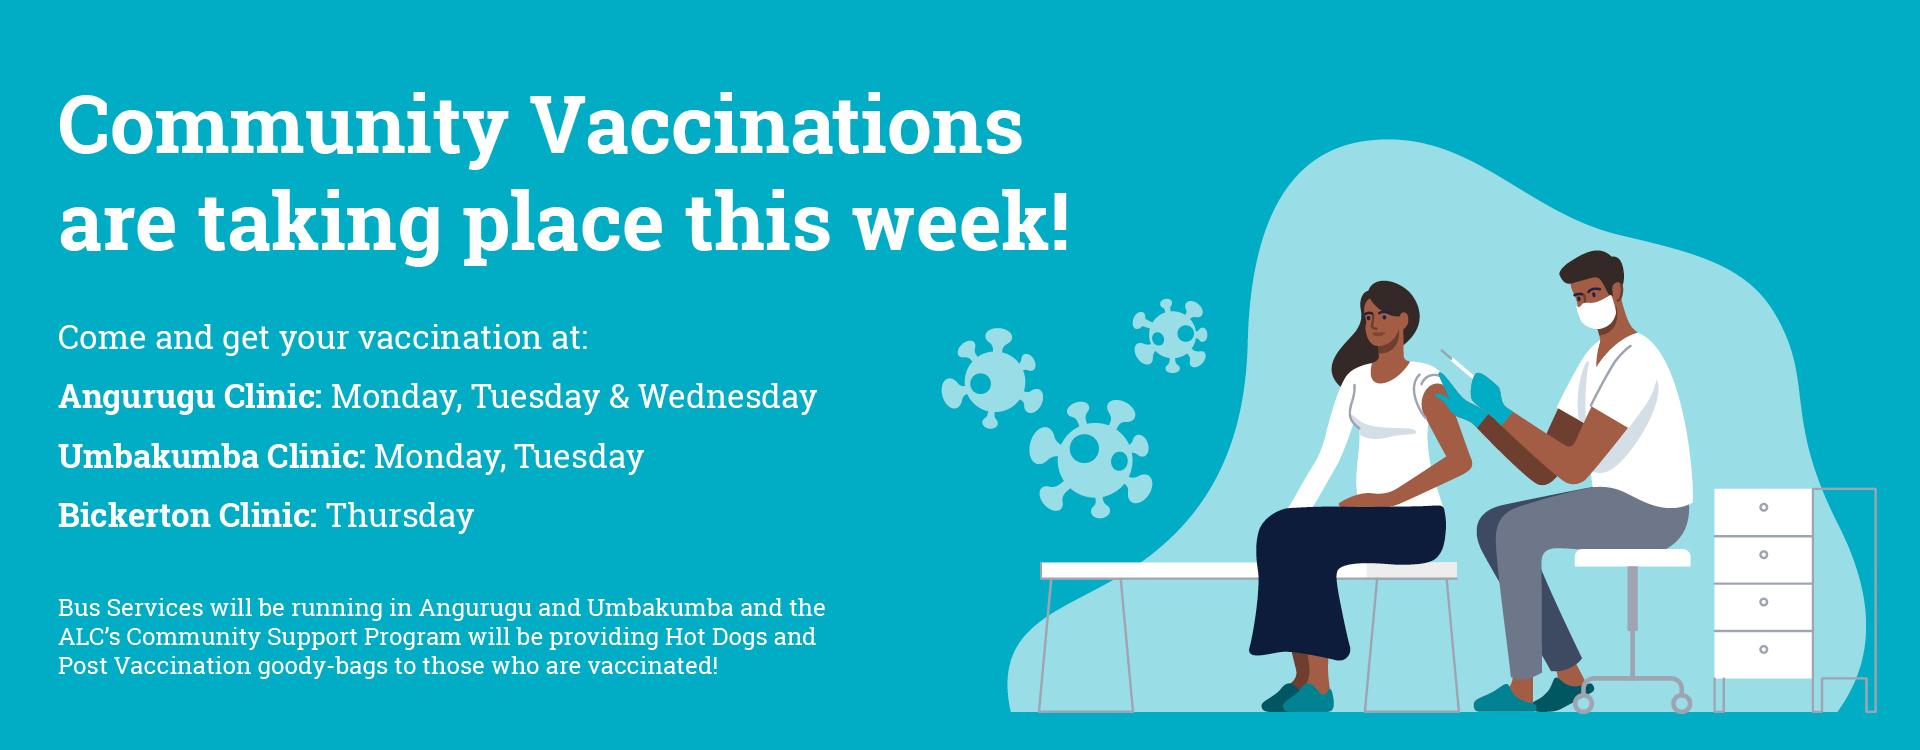 Community Vaccinations